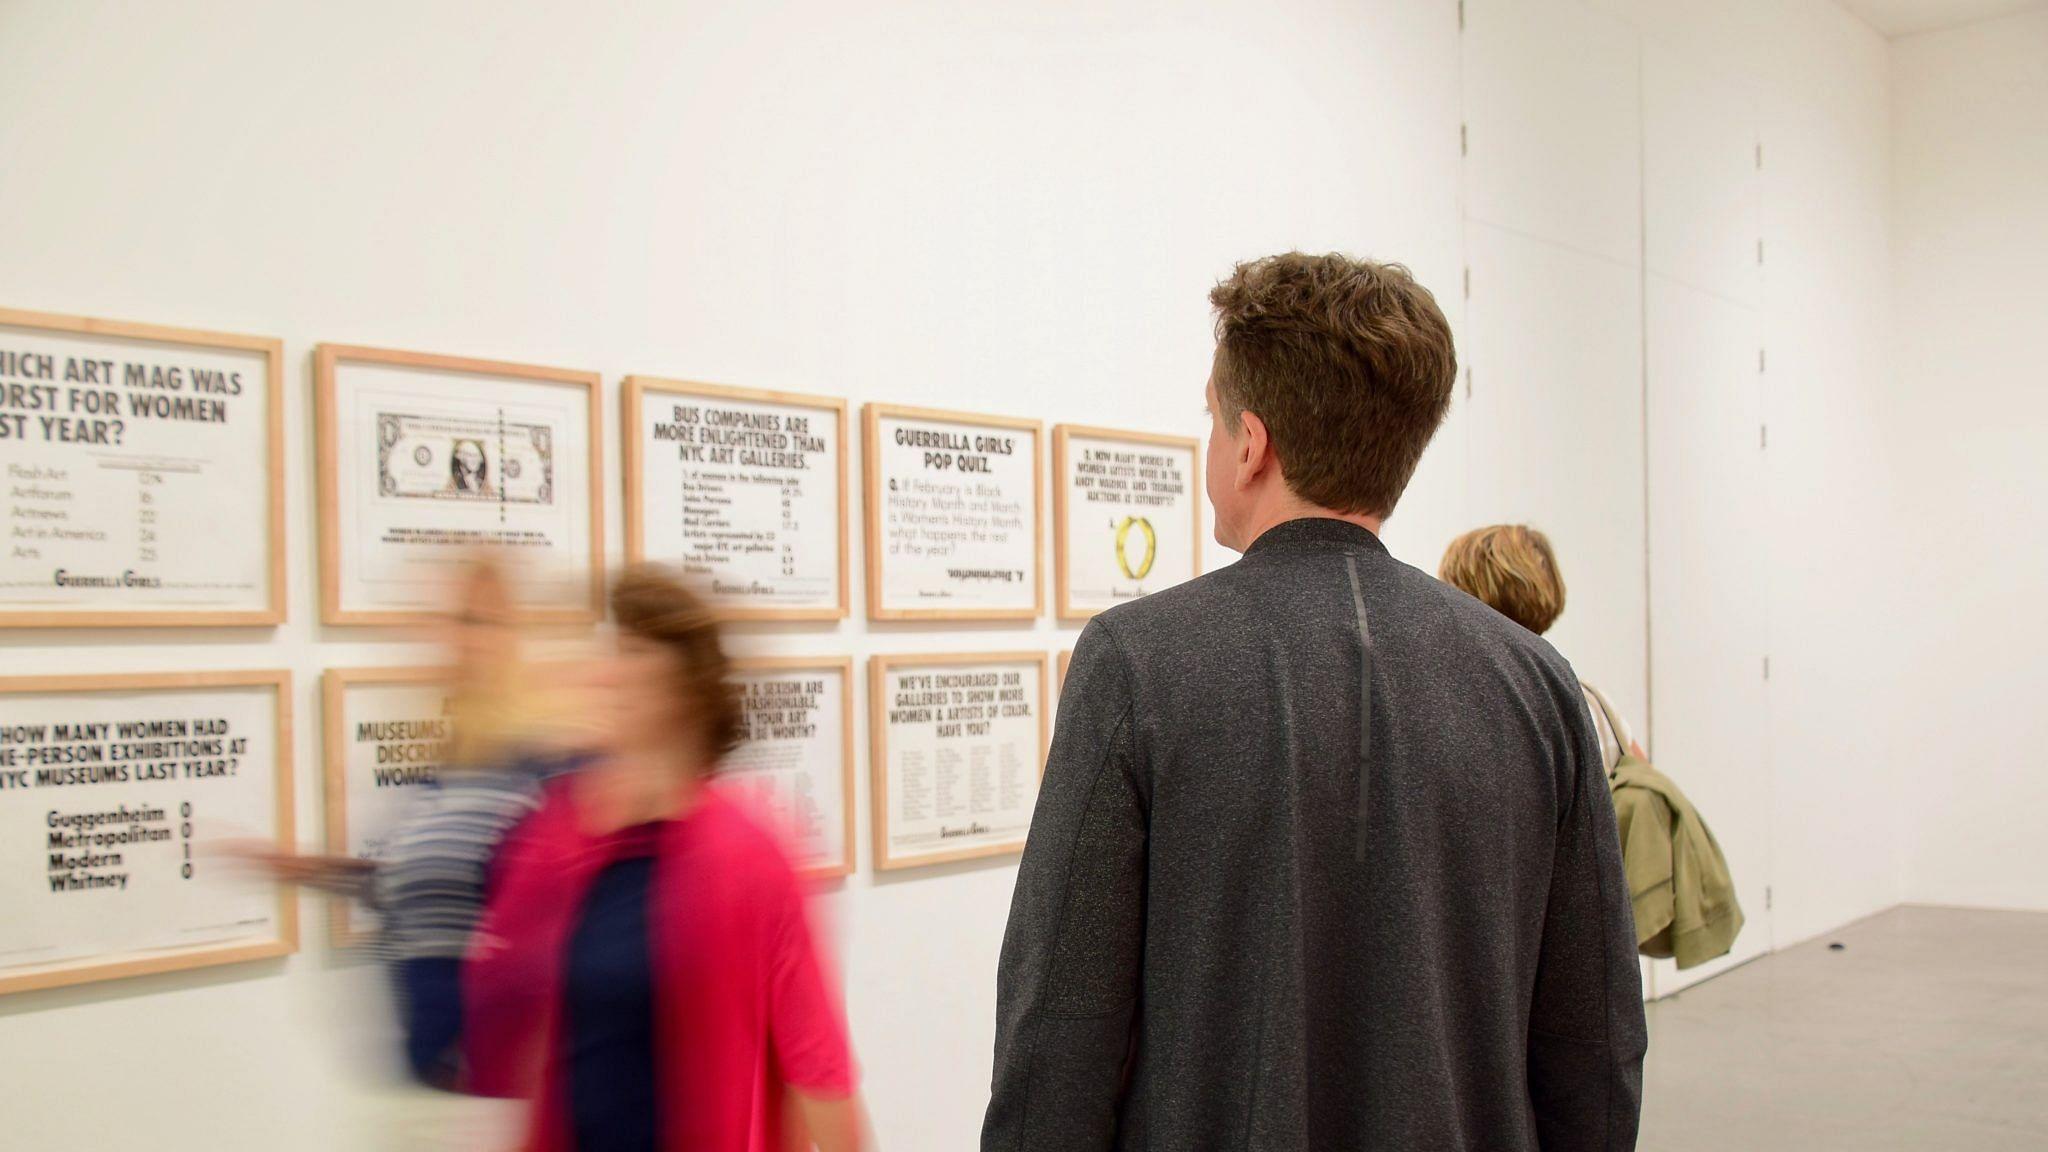 Studentenrabatte in Dresden für Museen